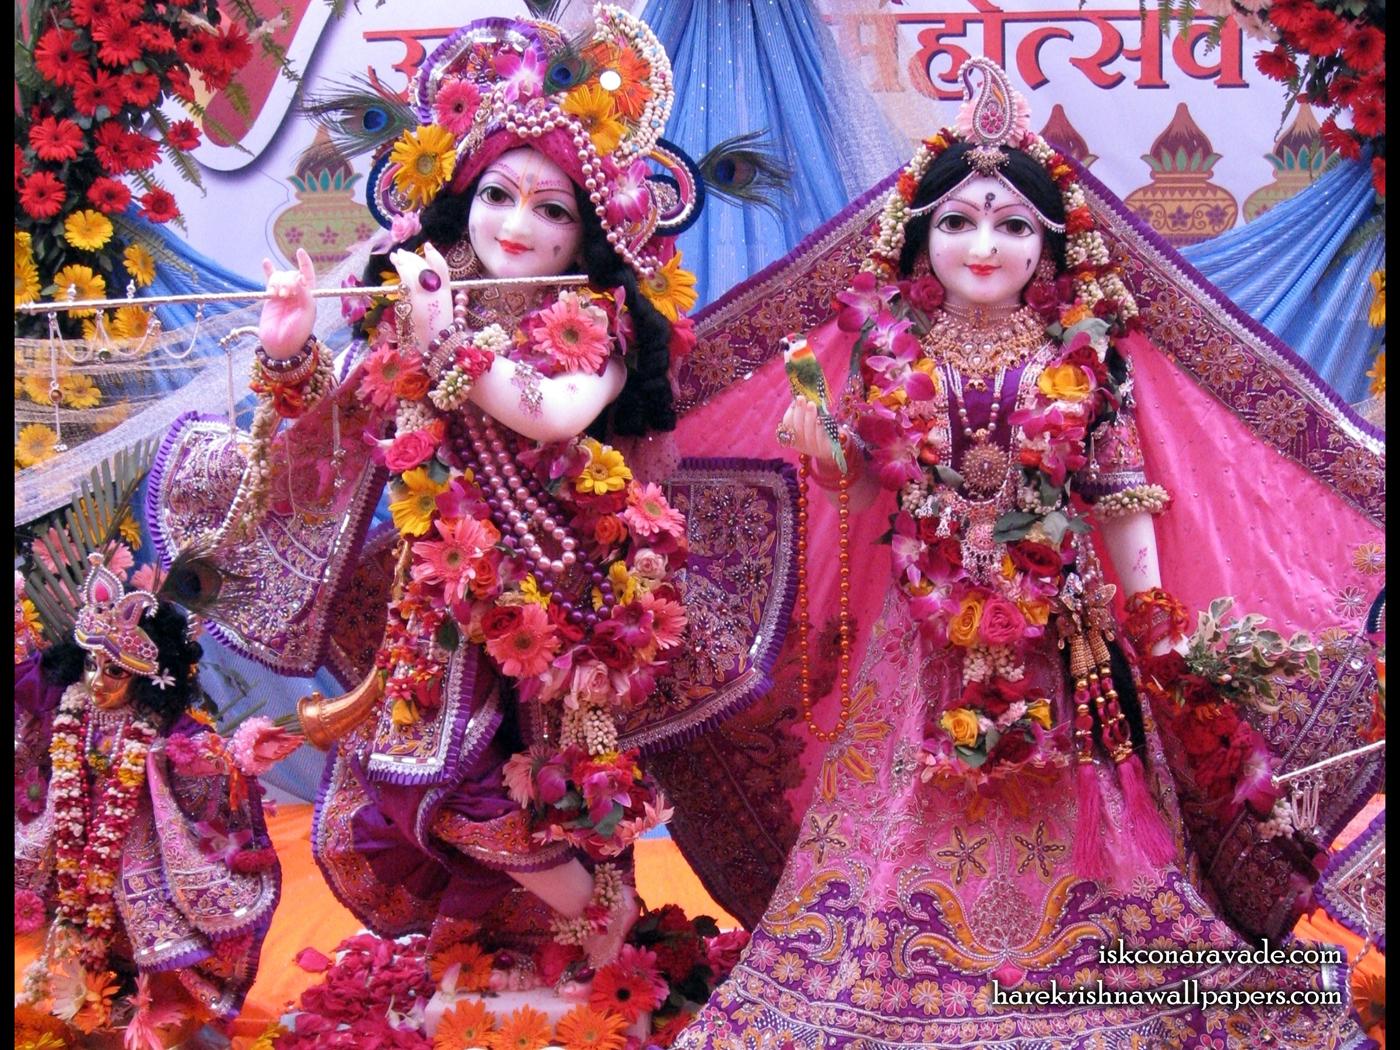 Sri Sri Radha Gopal Wallpaper (001) Size 1400x1050 Download